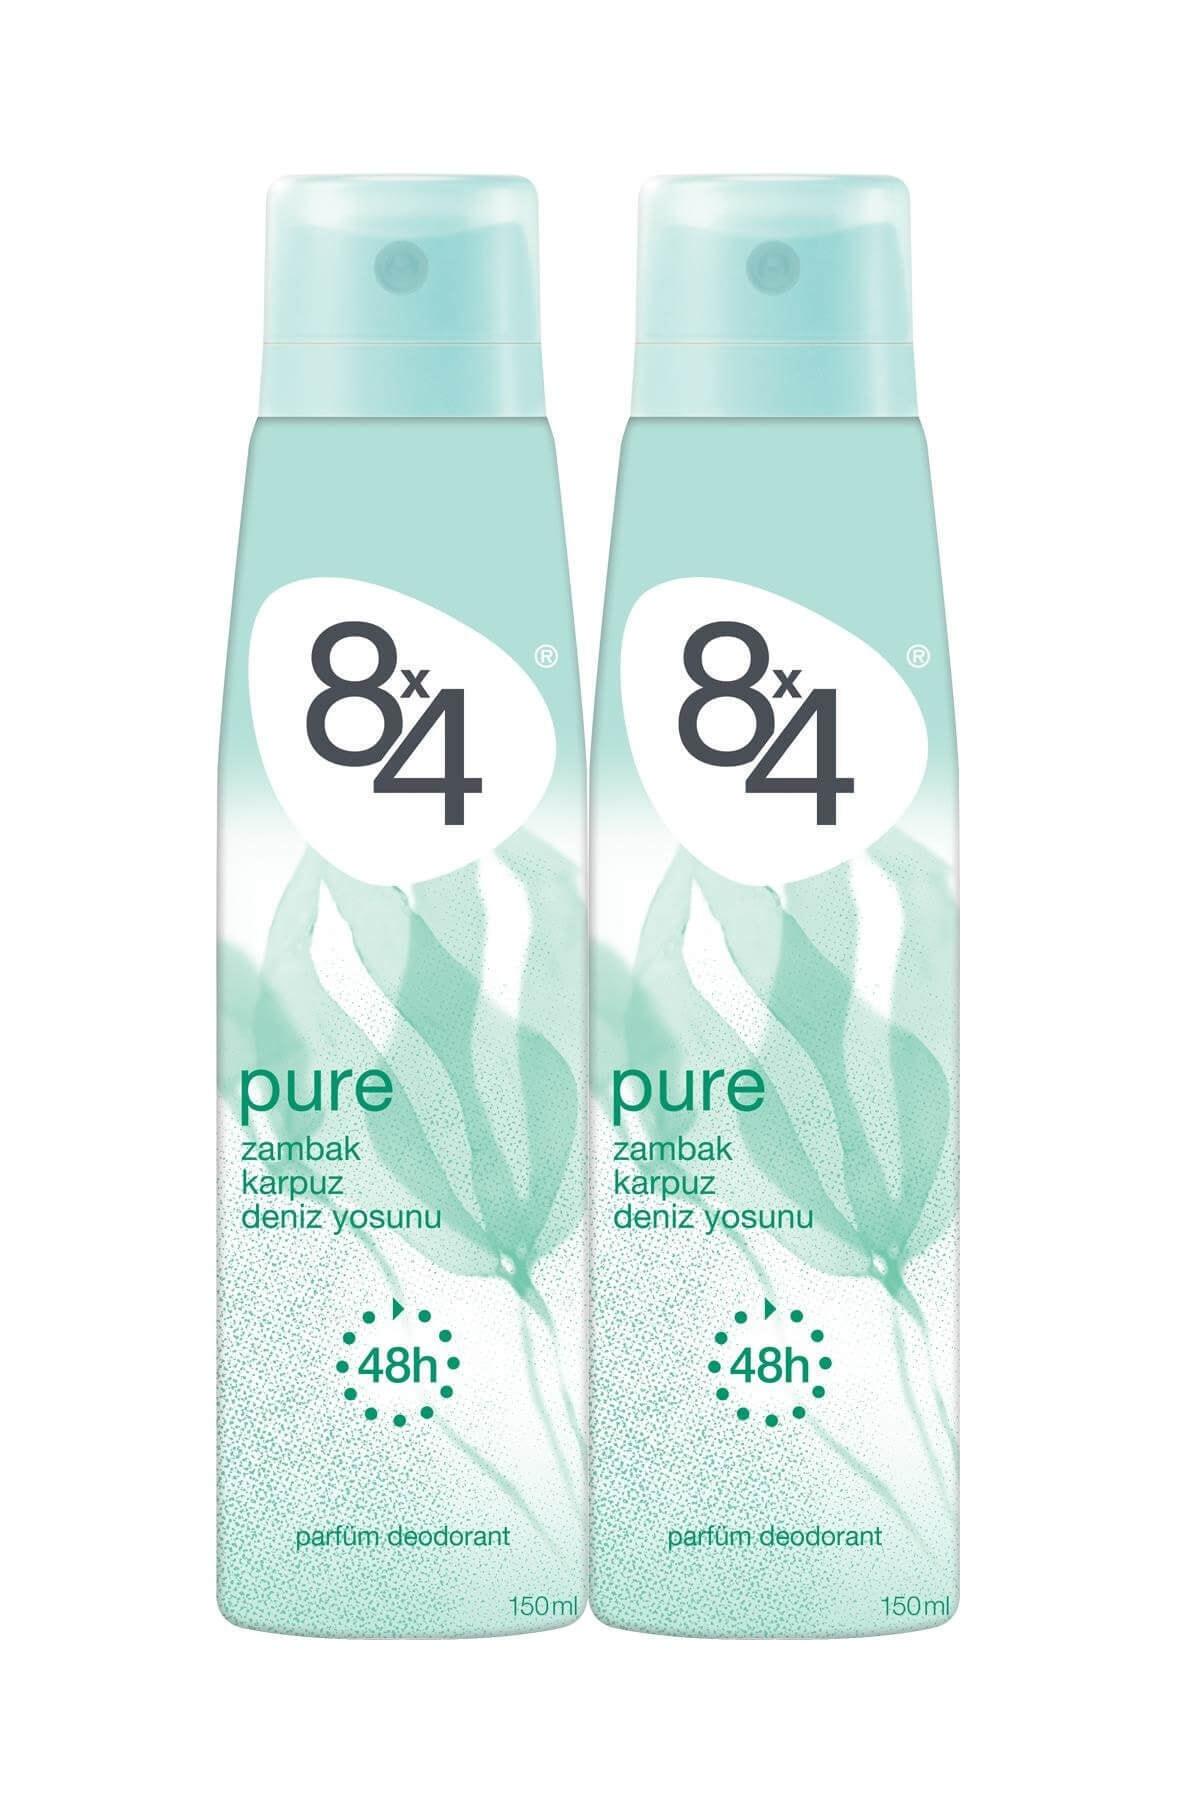 8x4 Pure Deo Sprey Kadın 150 ml 2 Adet 1